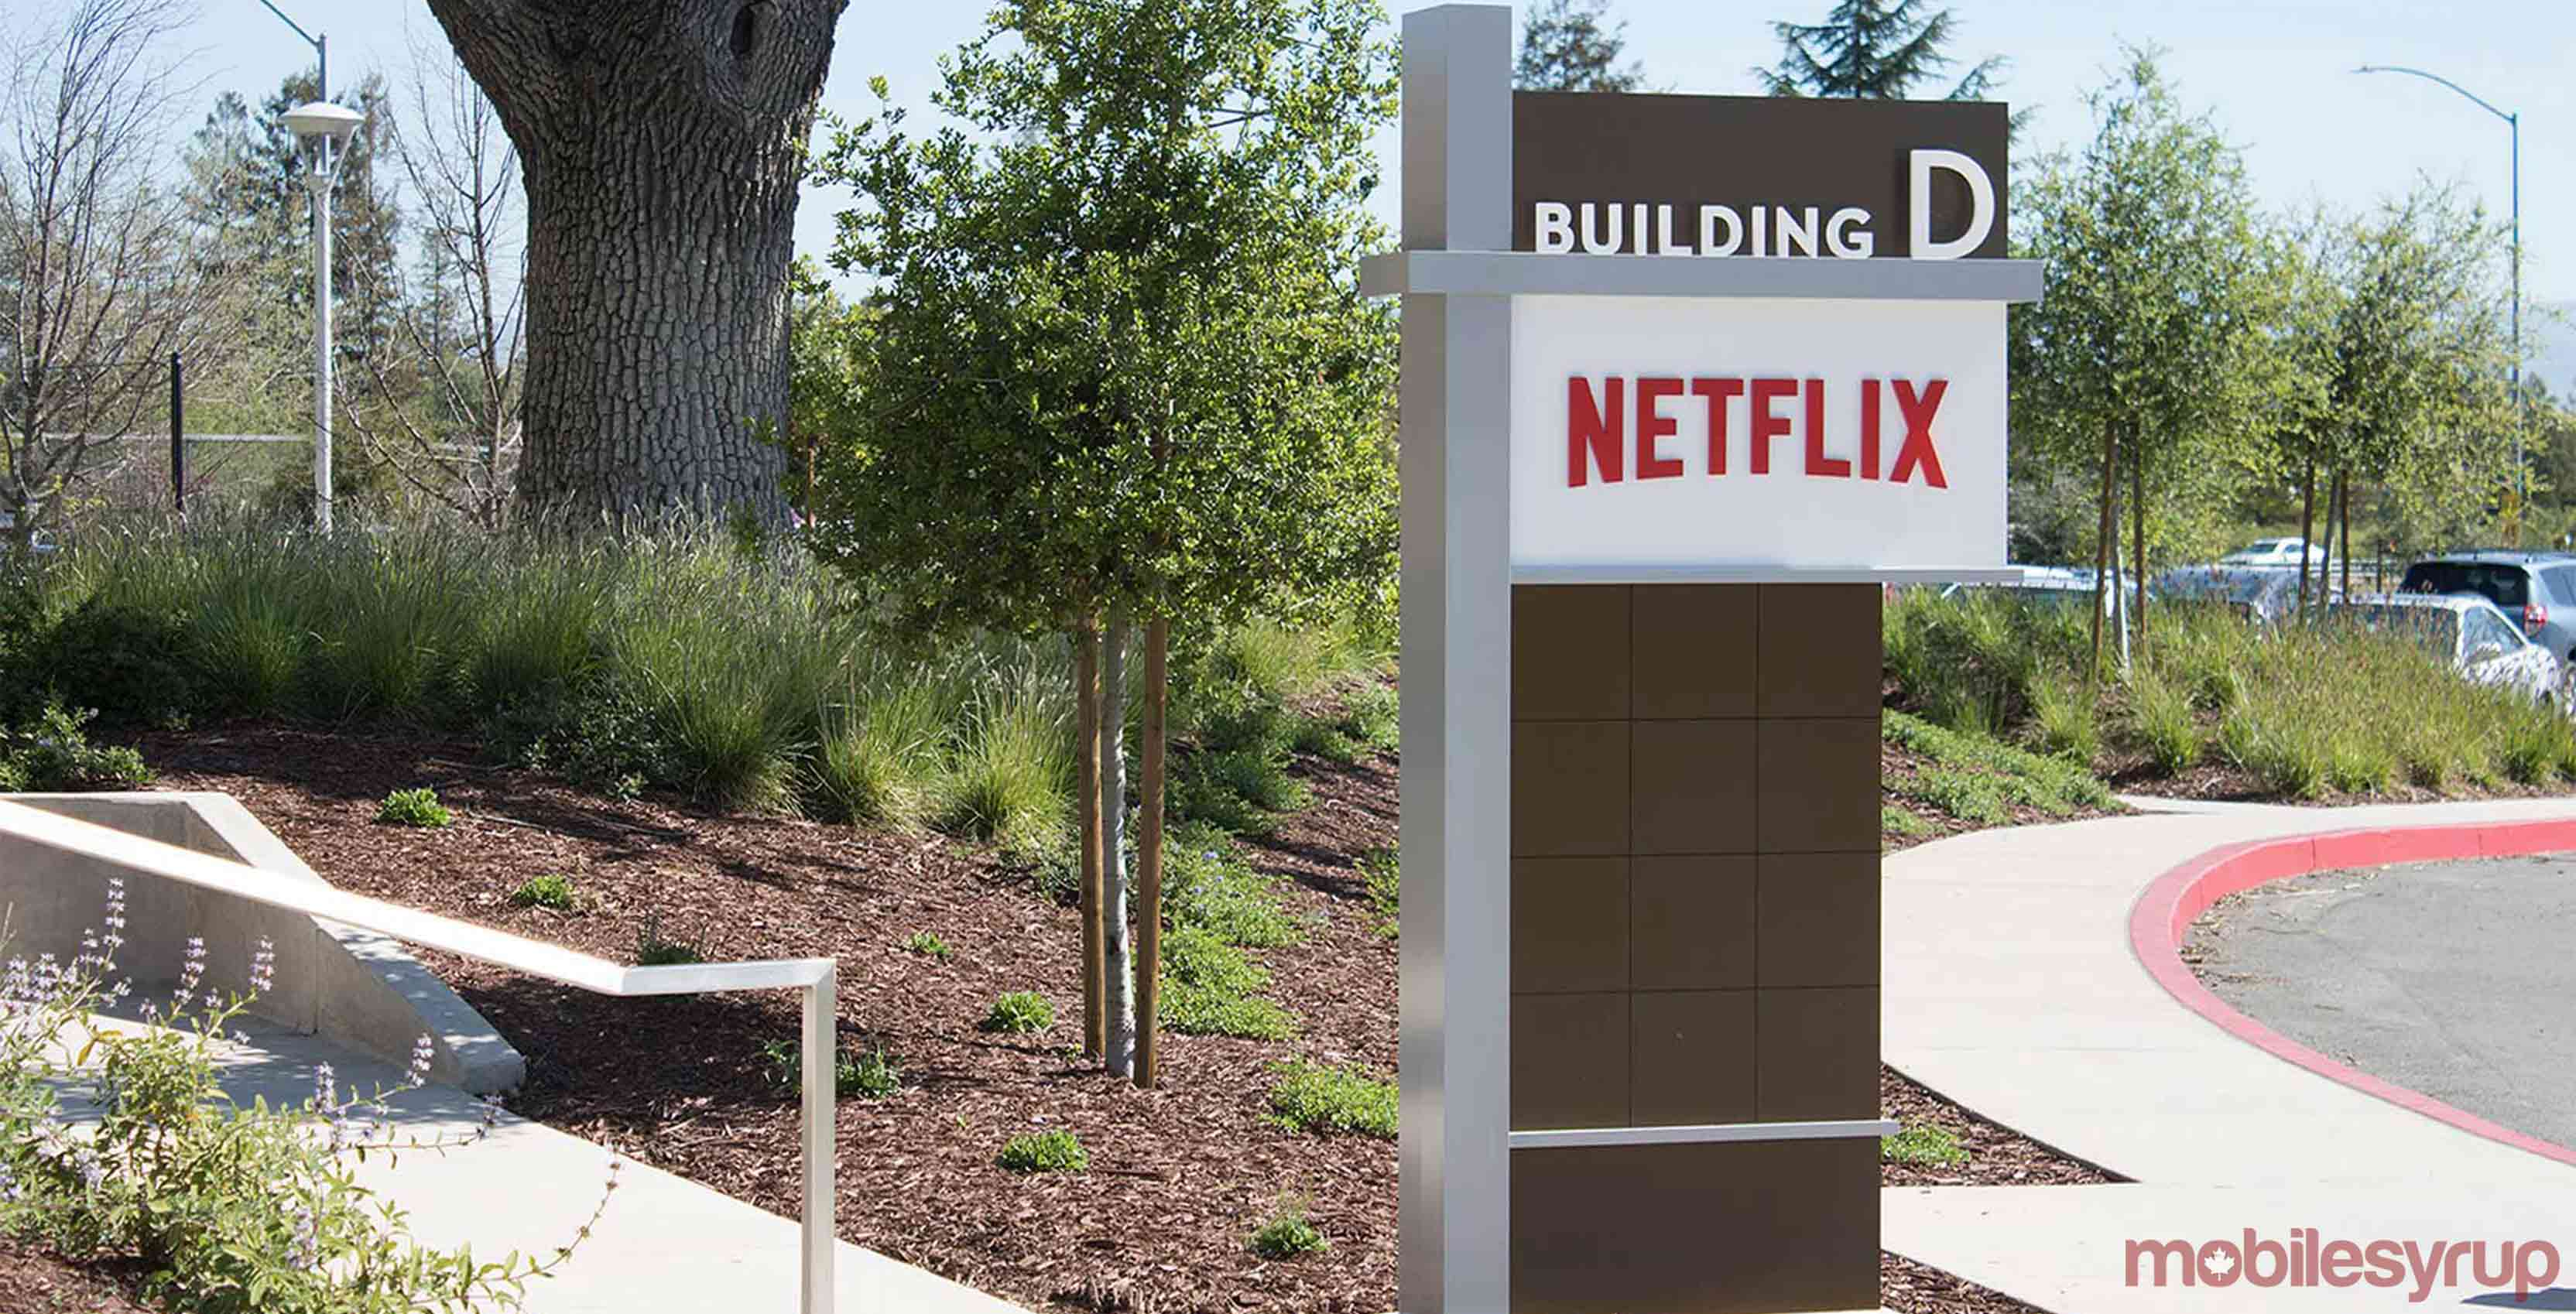 Netflix building D